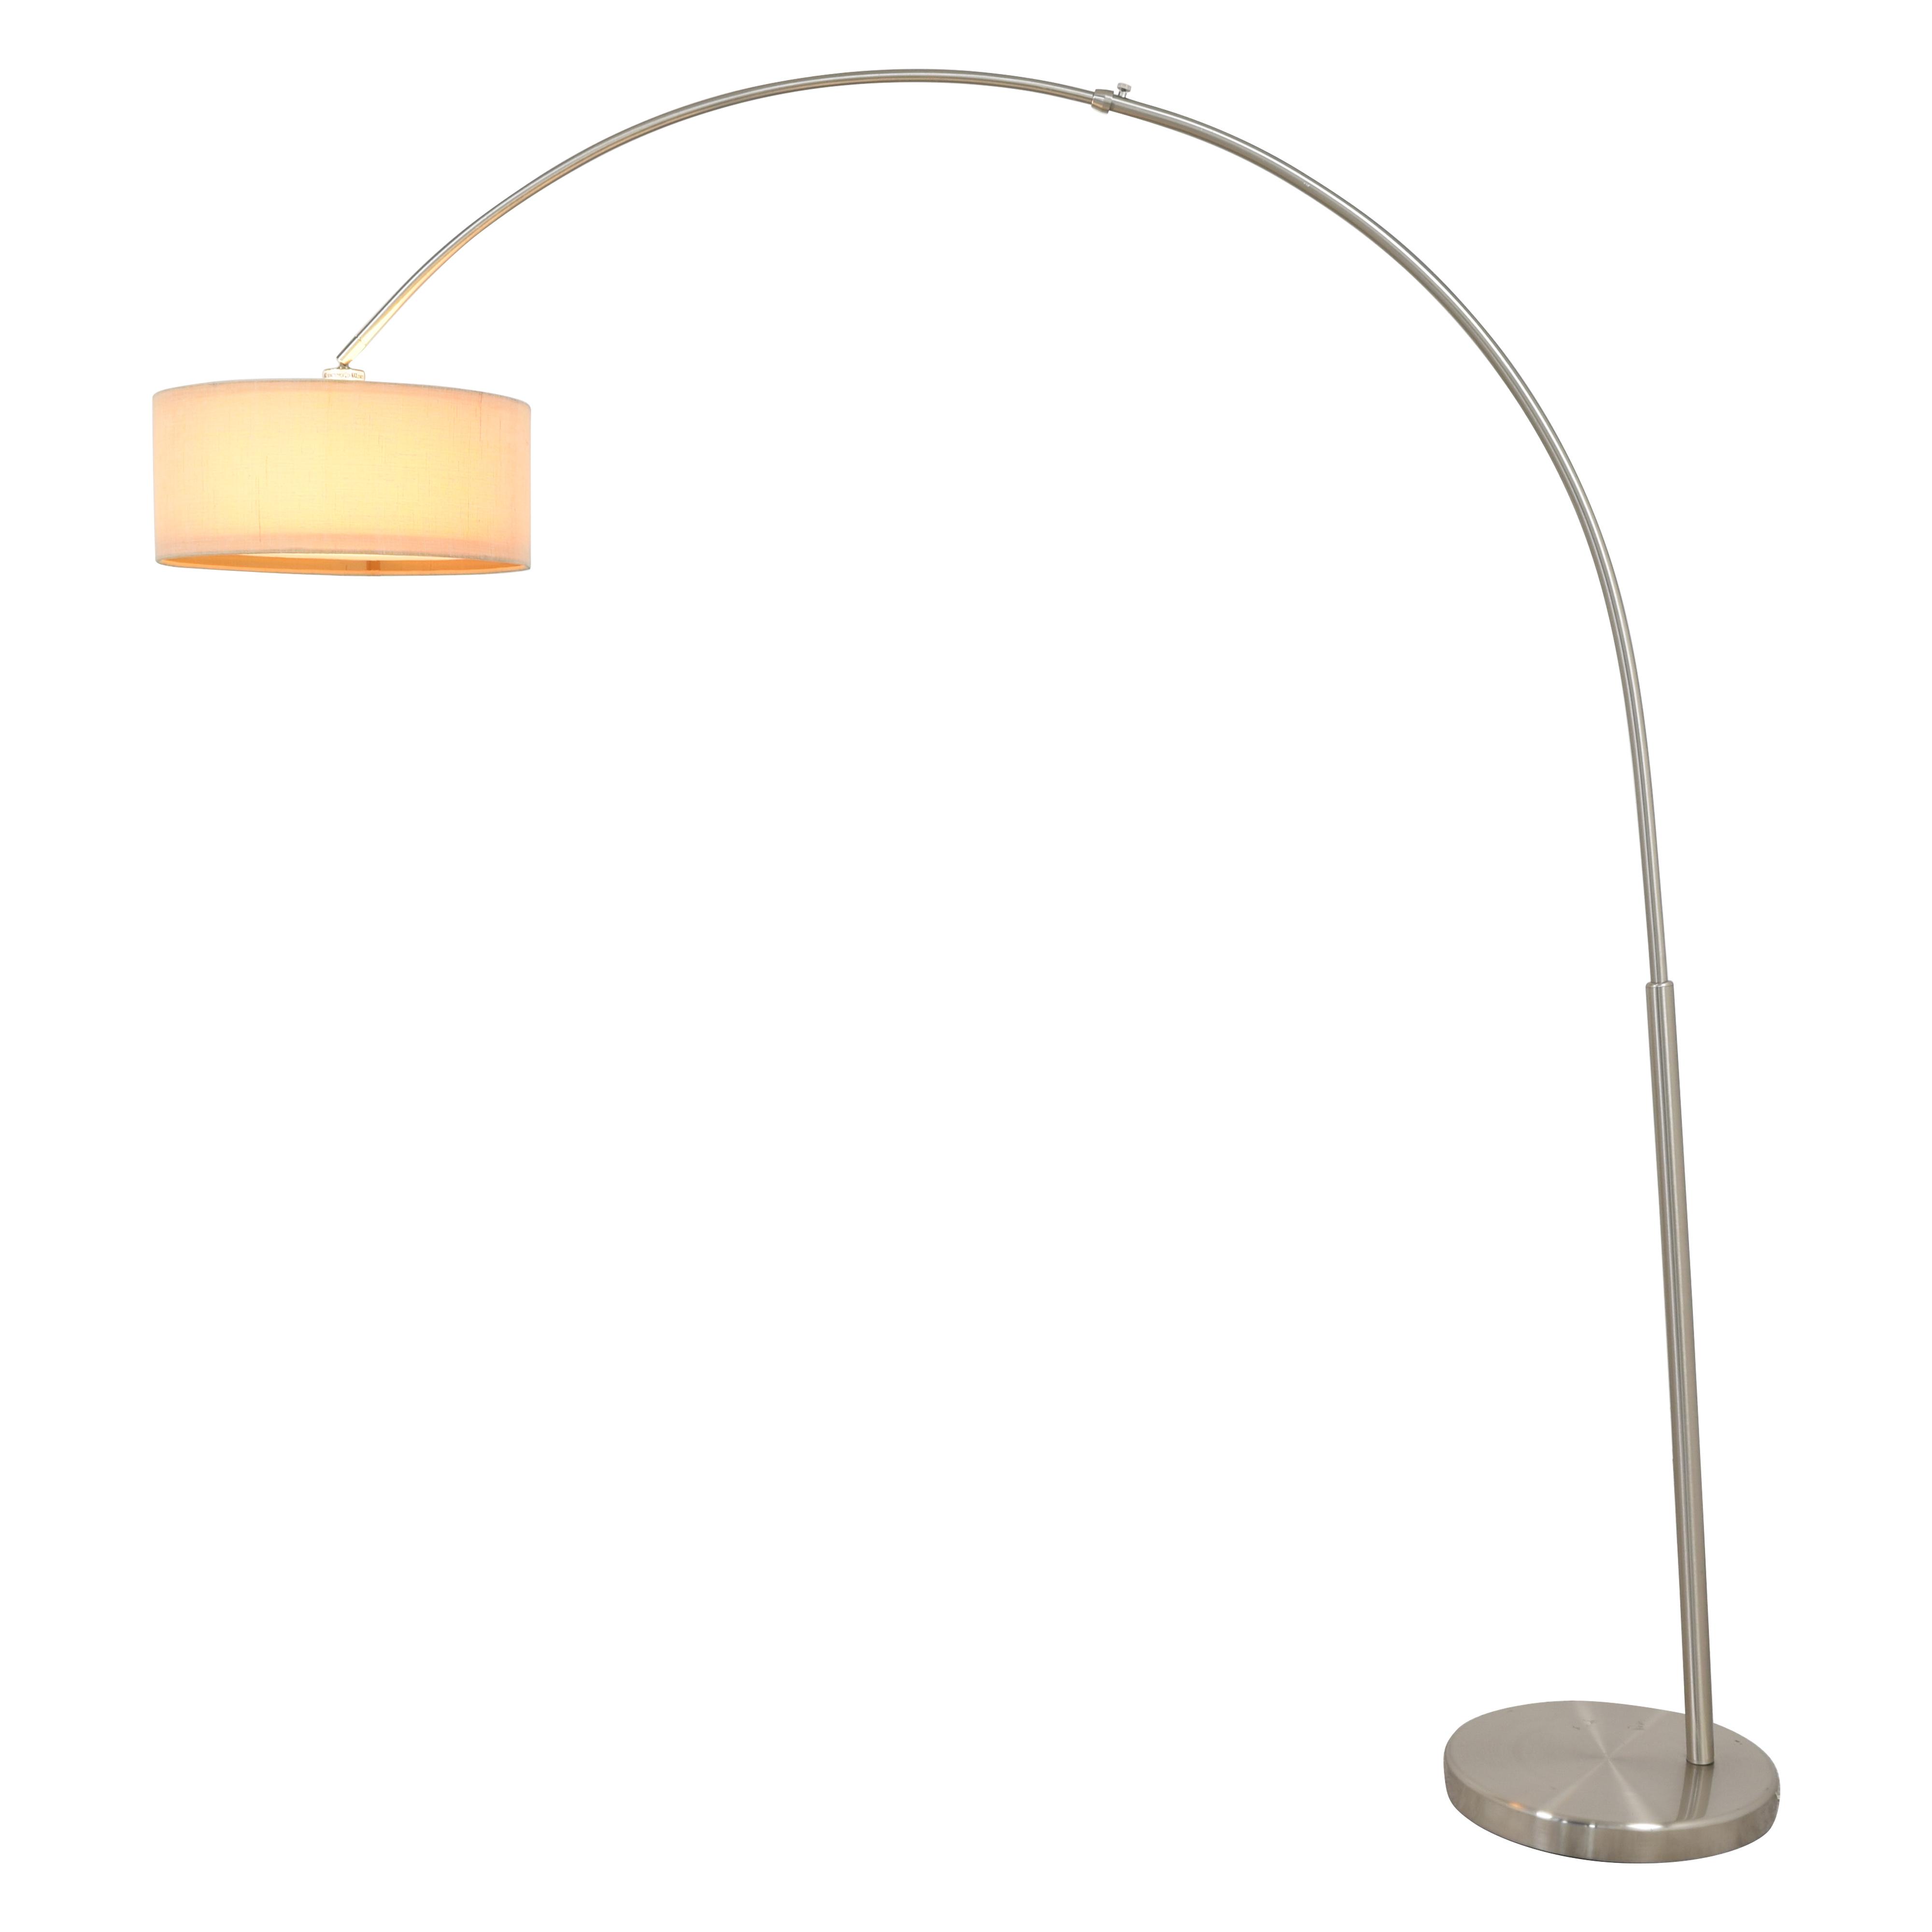 CB2 CB2 Big Dipper Arc Floor Lamp Lamps